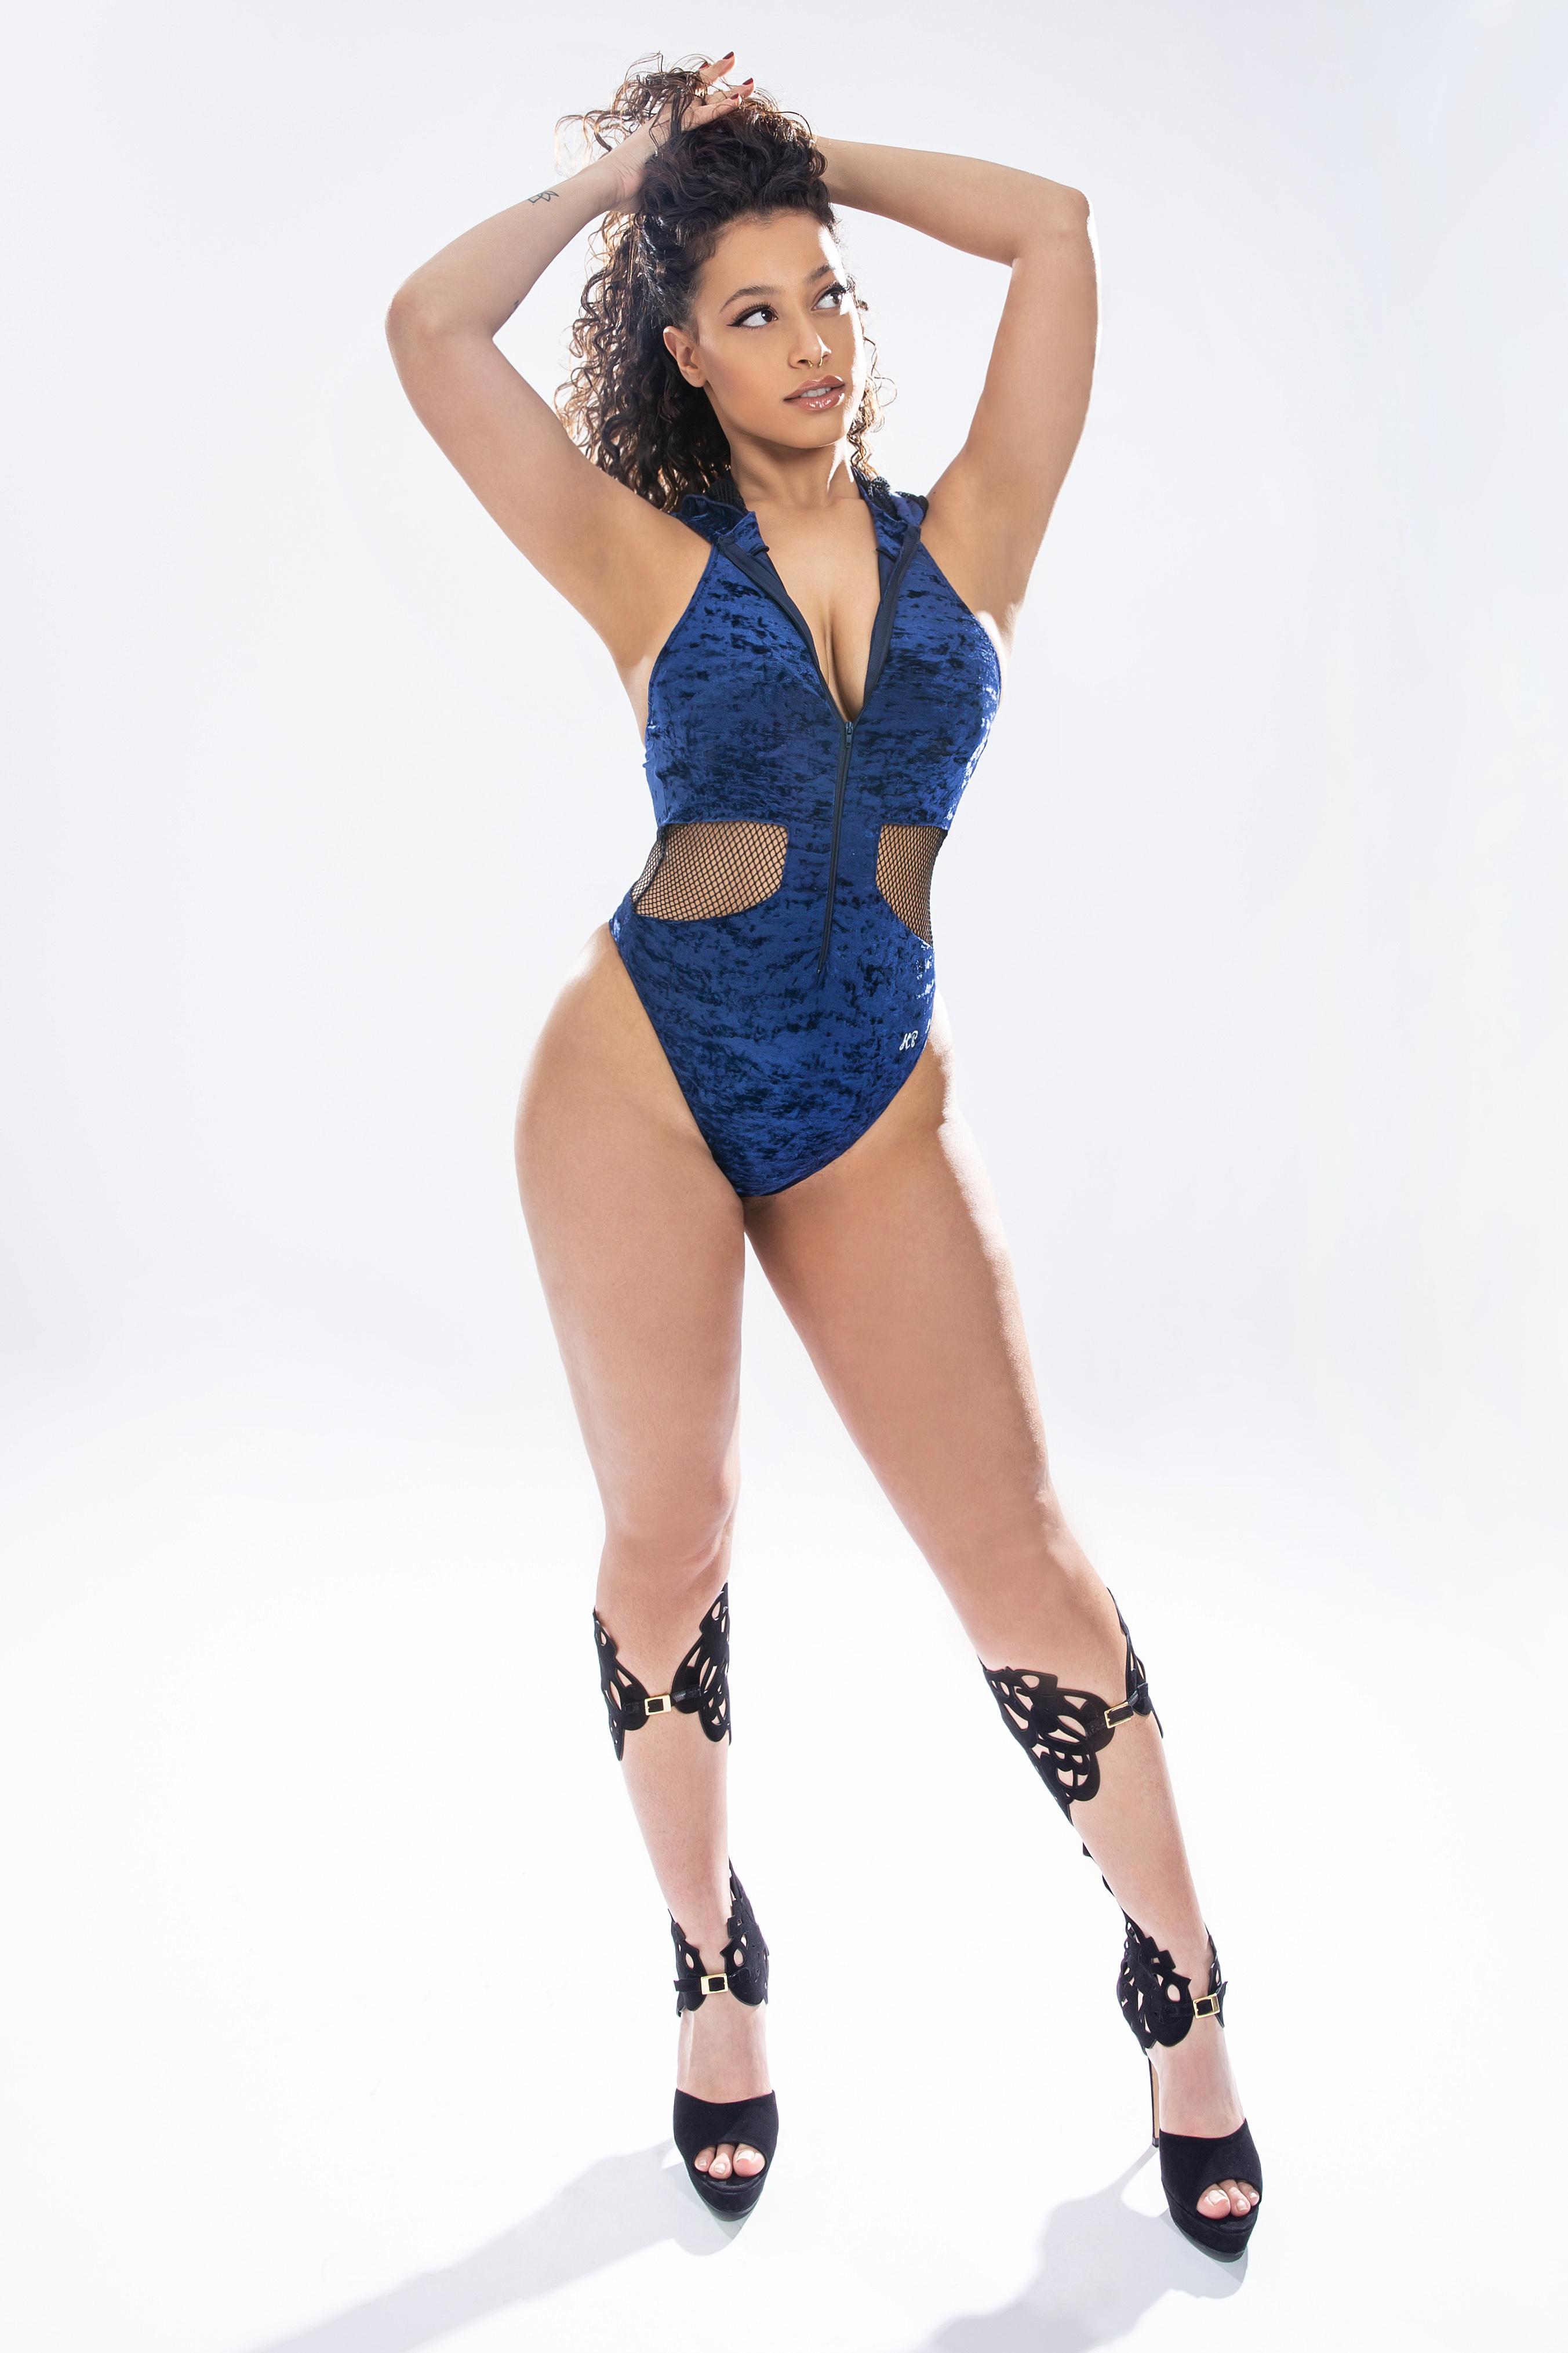 KP Body Dancer blue with hood in mesh